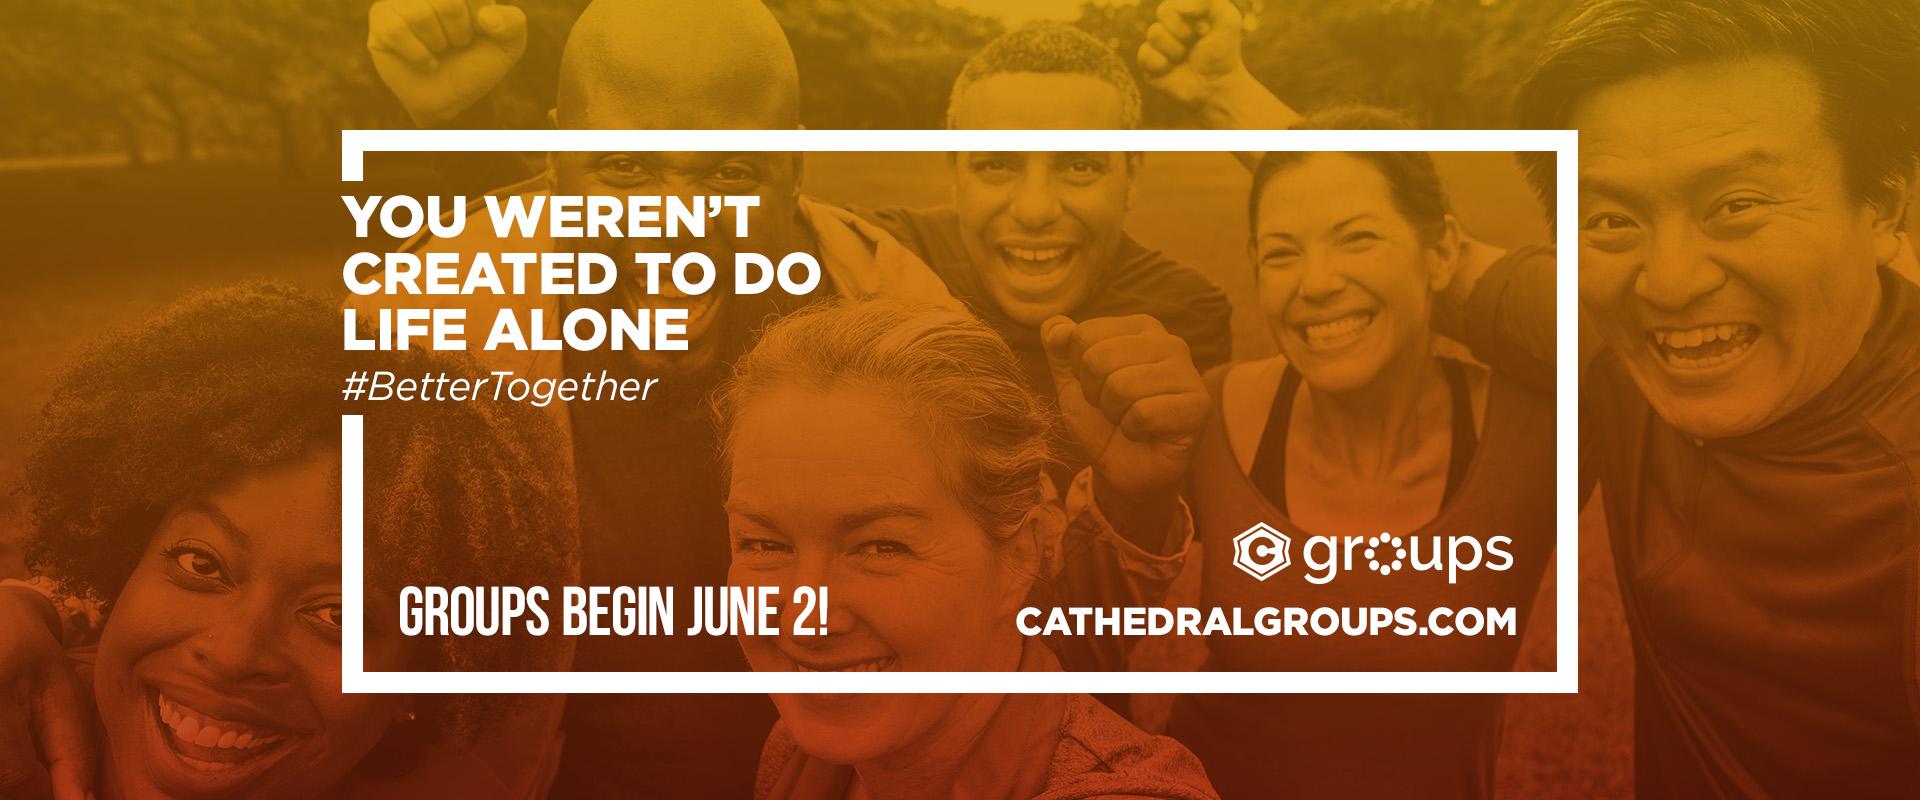 Summer Groups Begin June 2!